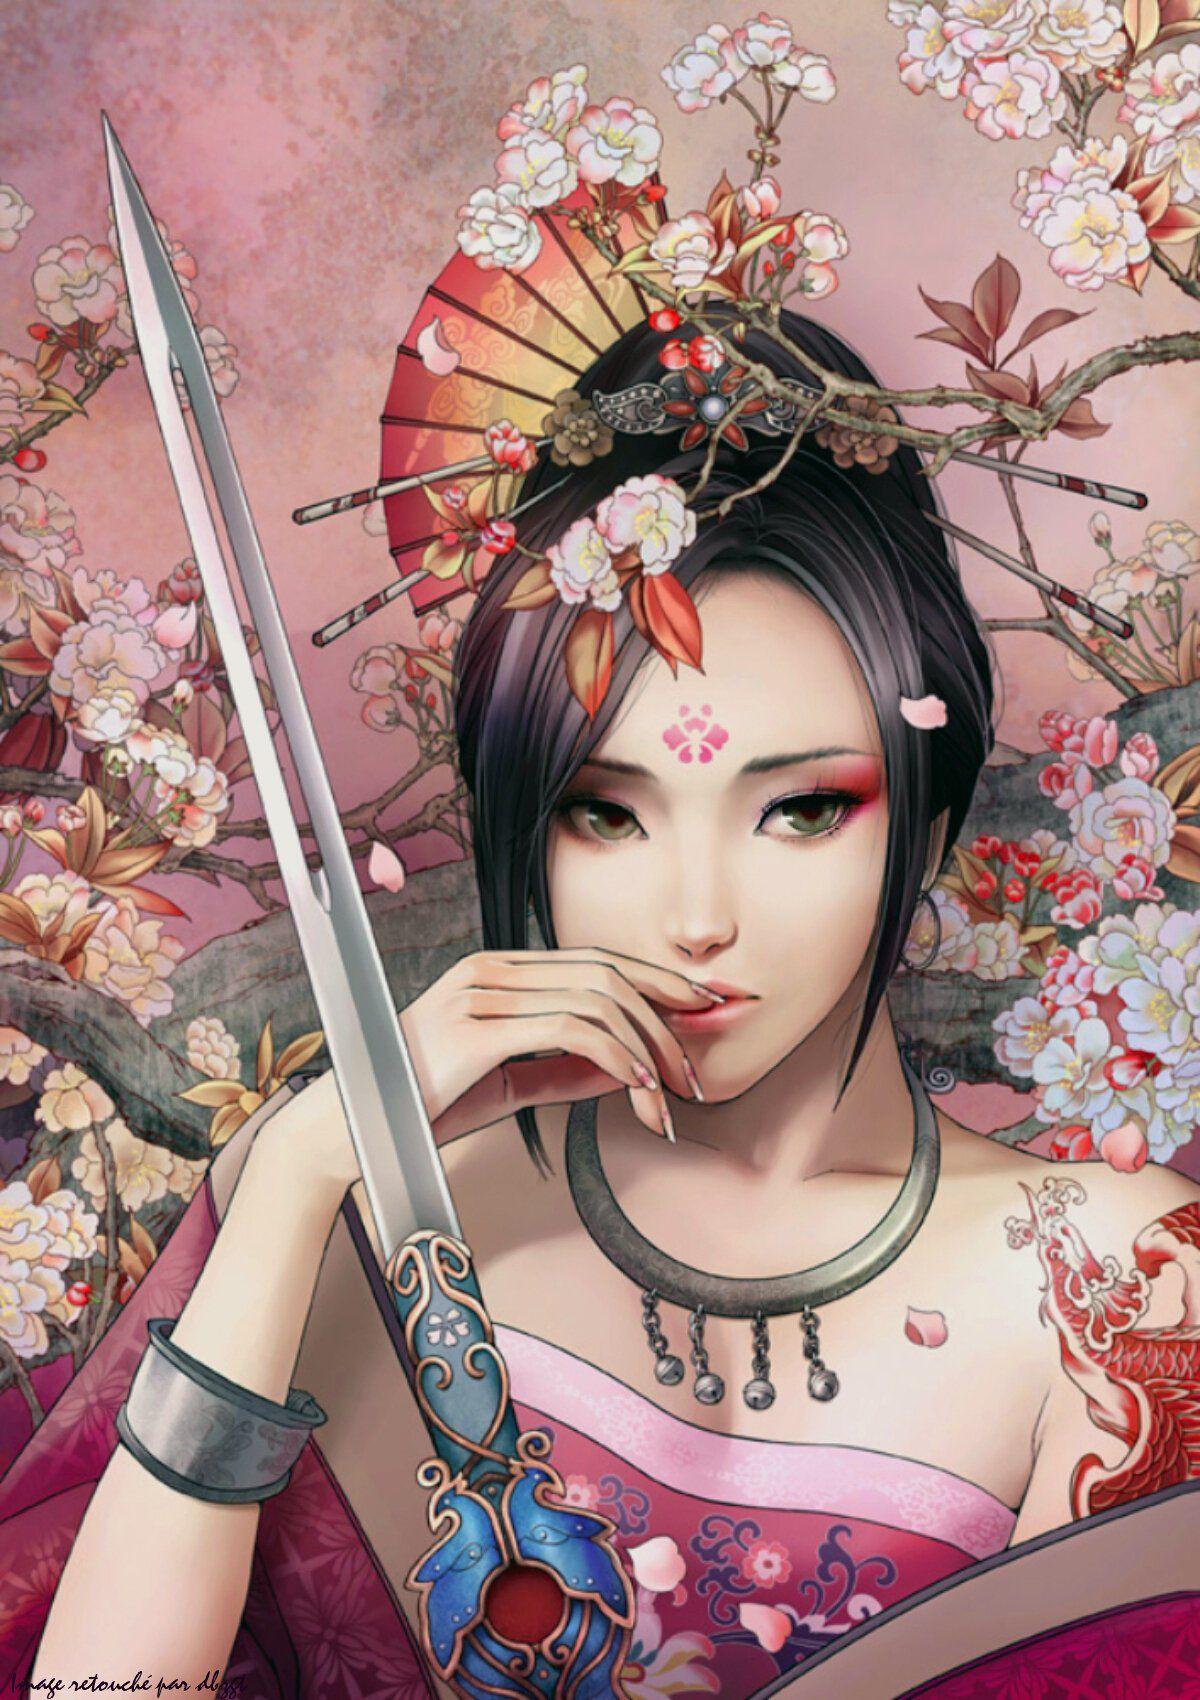 Fonds d'écran Art - Numérique Femmes - Féminité   amit kérek 4   Femme samouraï, L'art du ...